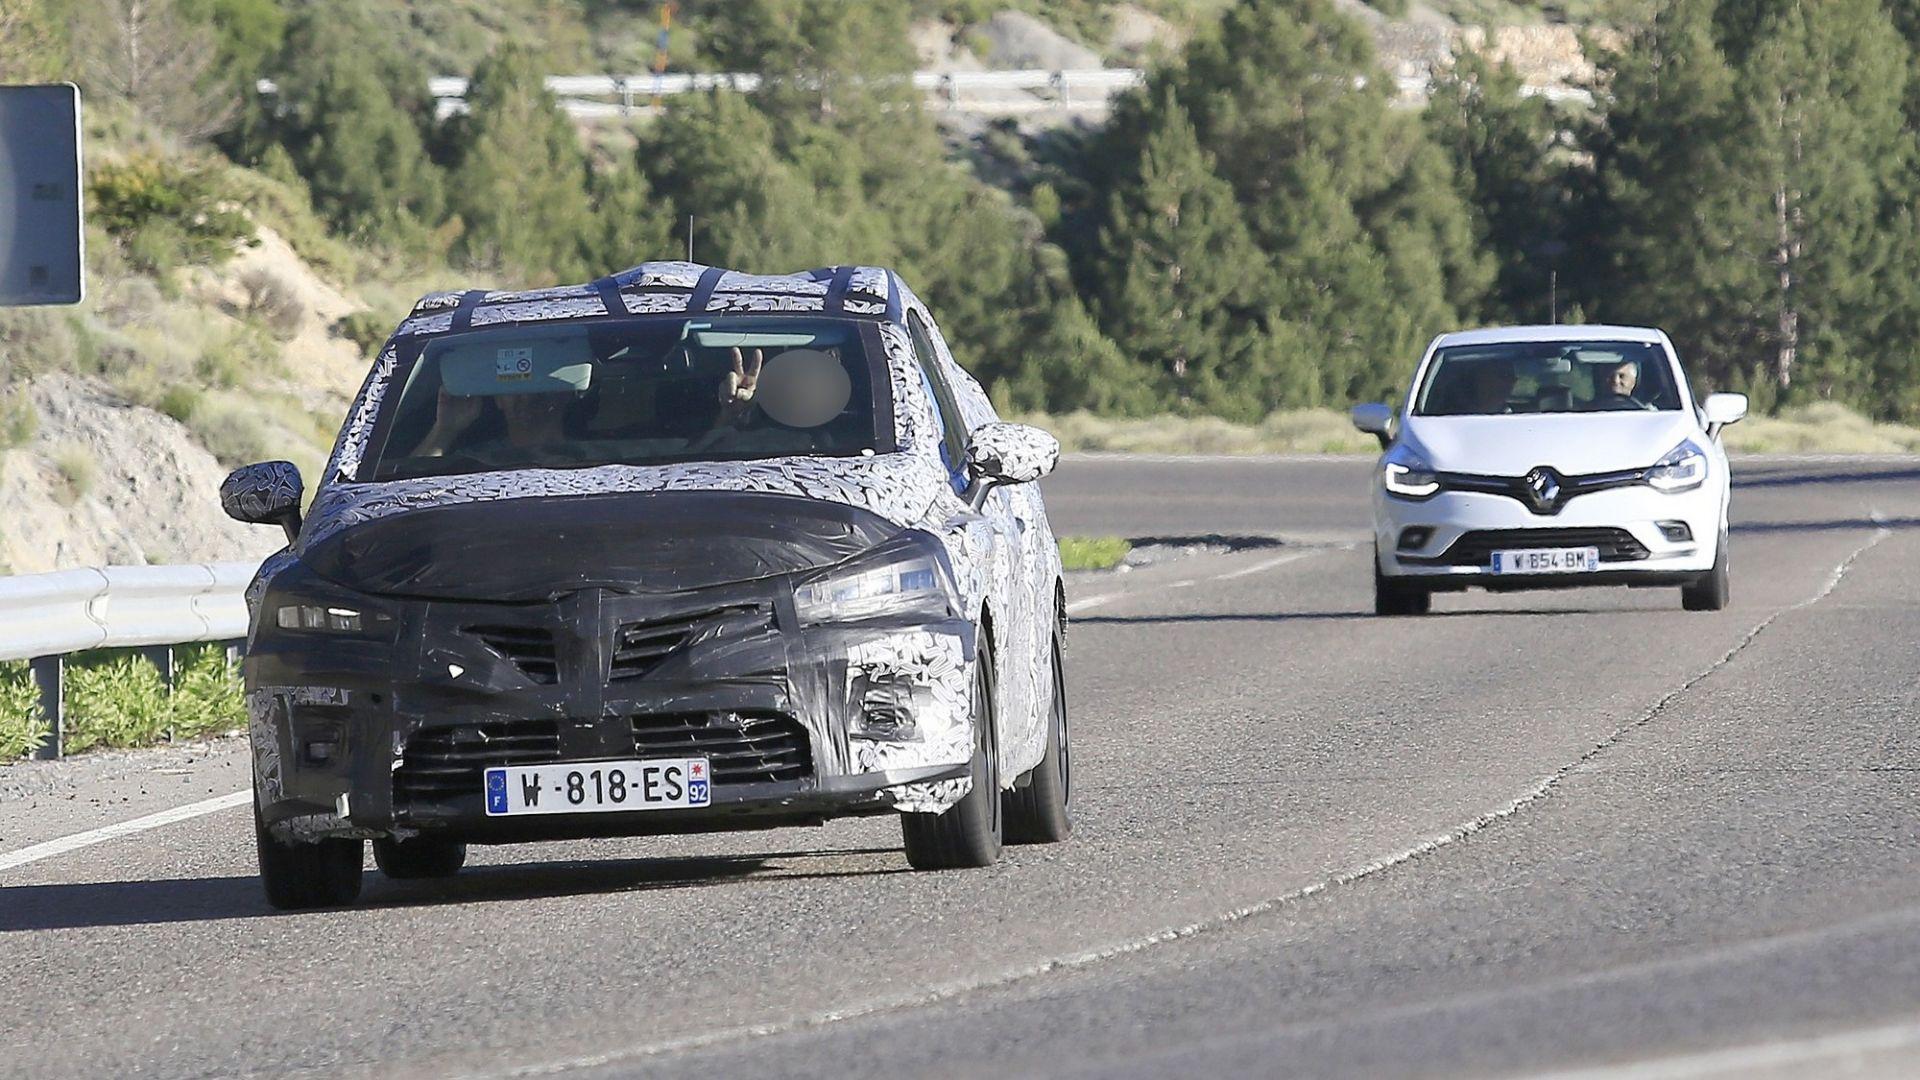 Subaru Brz Turbo >> Nuova Renault Clio 5 2019: foto, dimensioni, motori ...